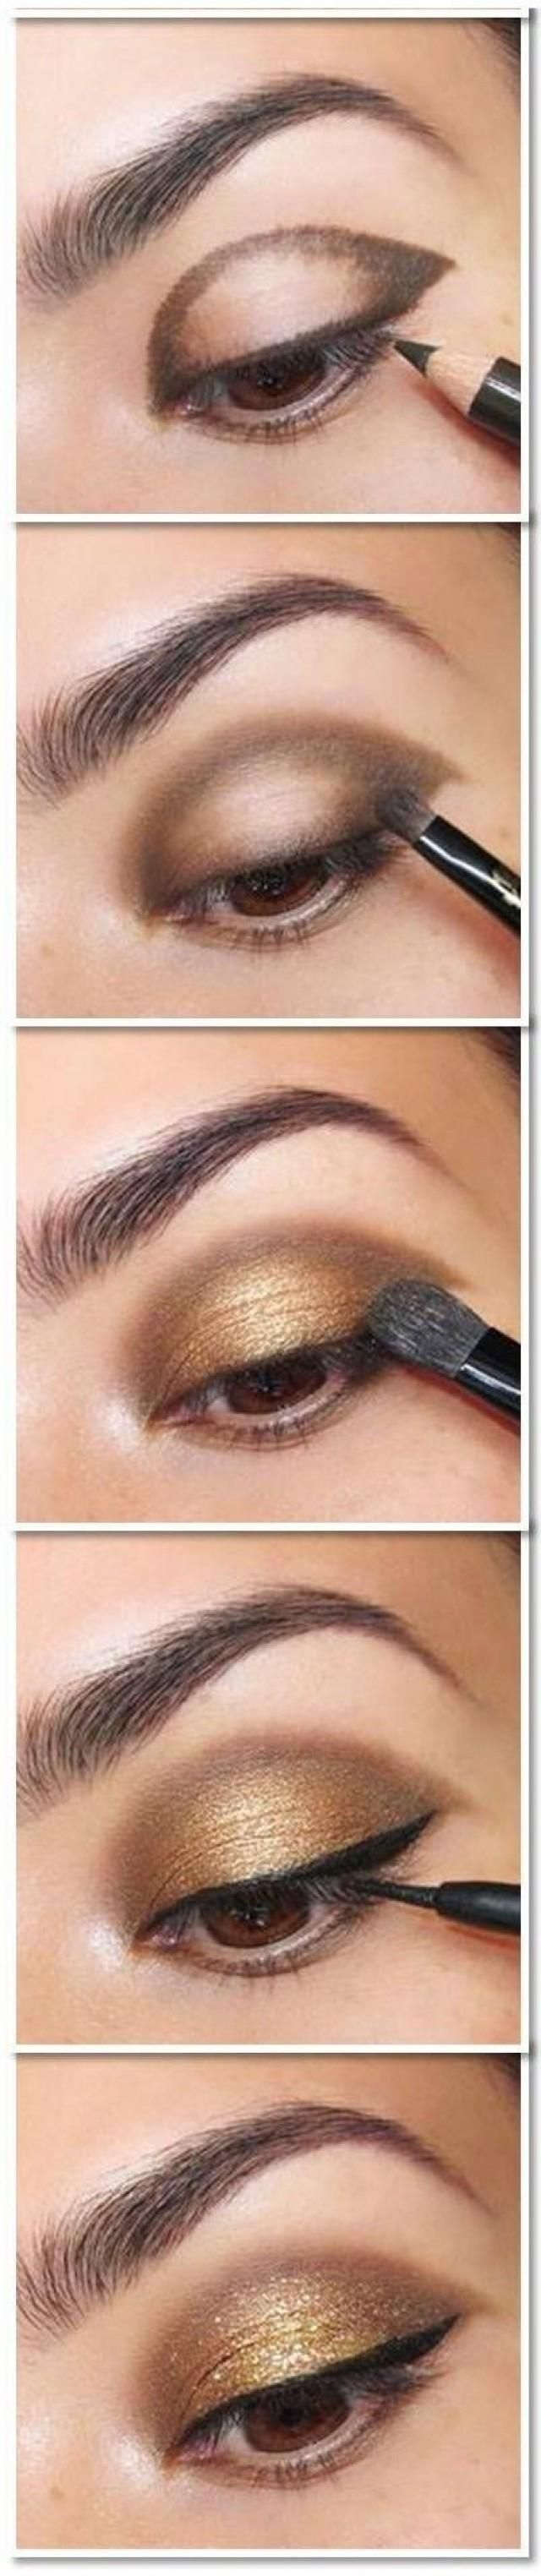 25 best ideas about coiffure facile on pinterest - Smoky eyes tuto ...